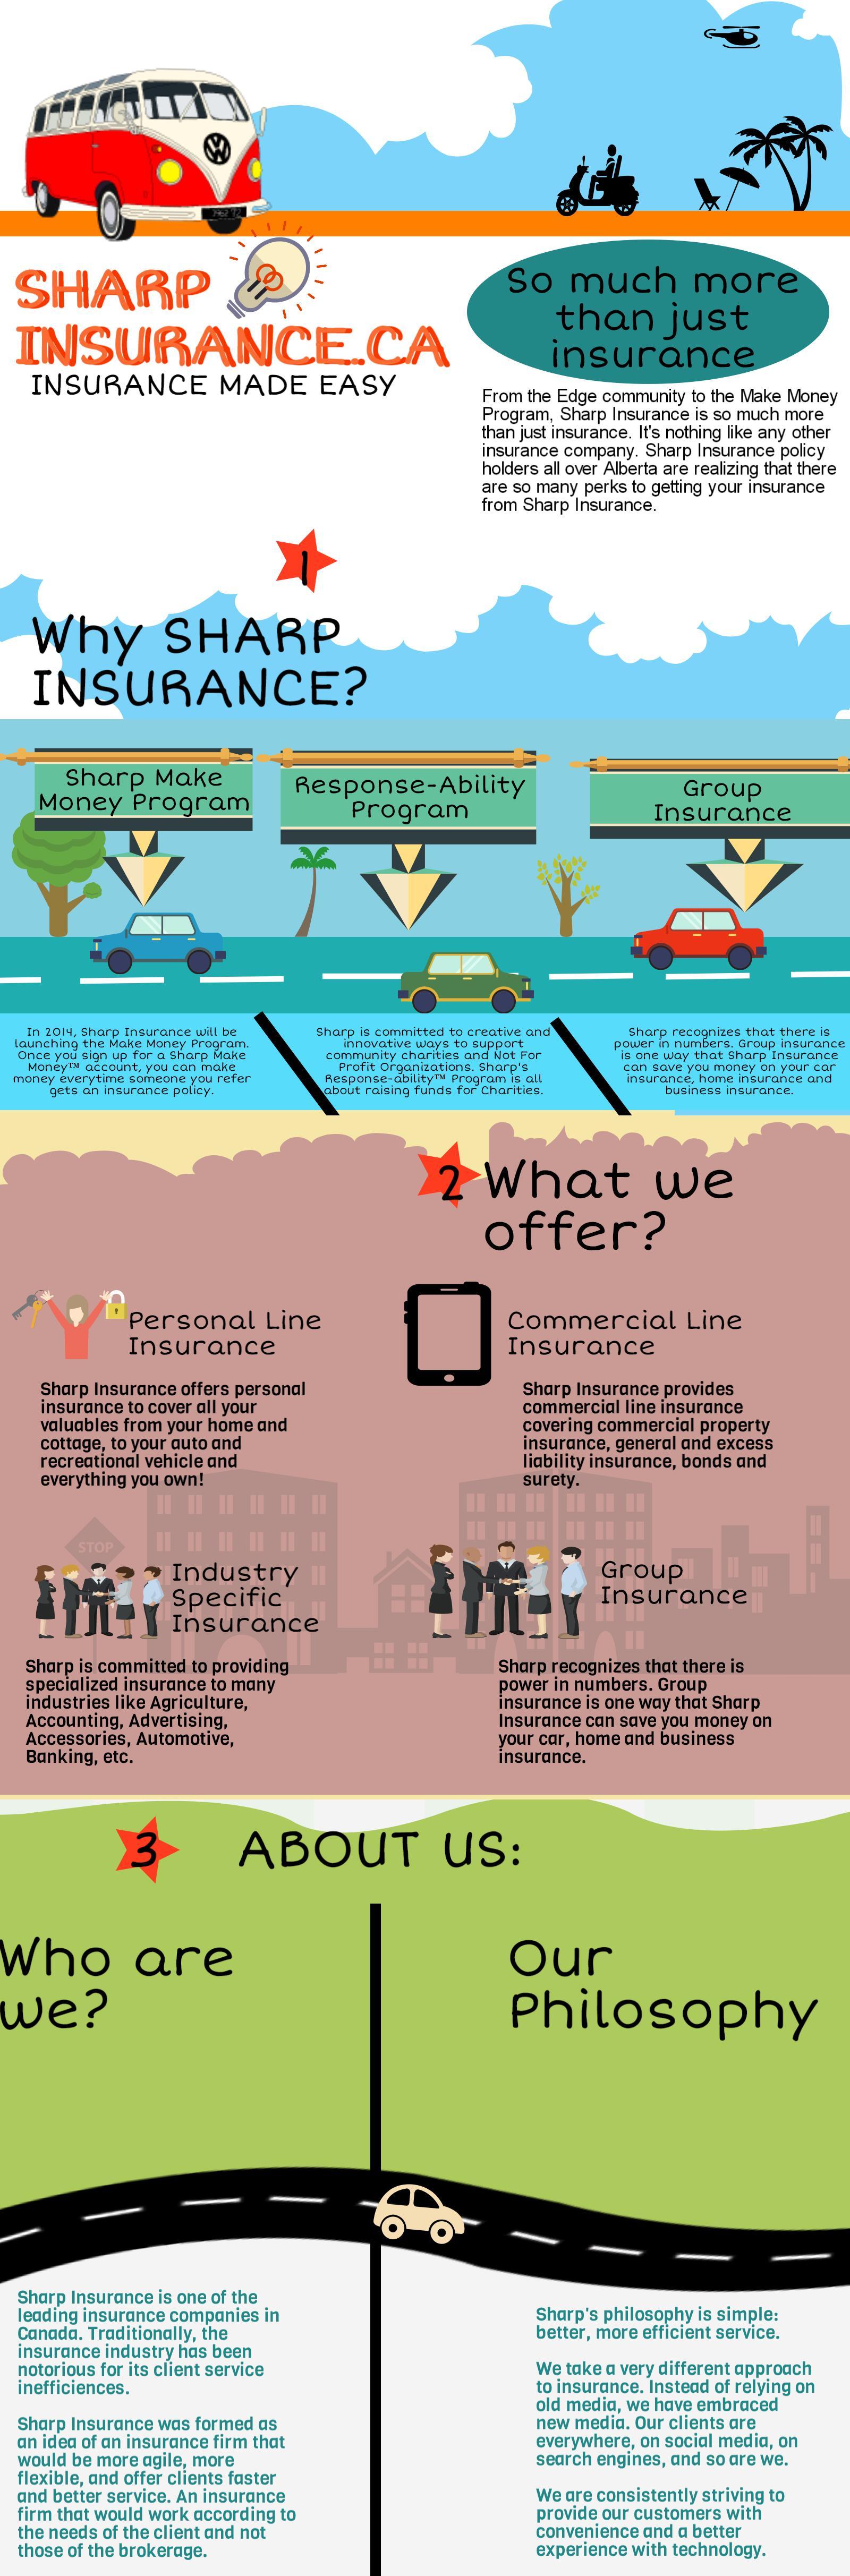 Pin by Bullfrog Insurance on Sharp Insurance Infographic